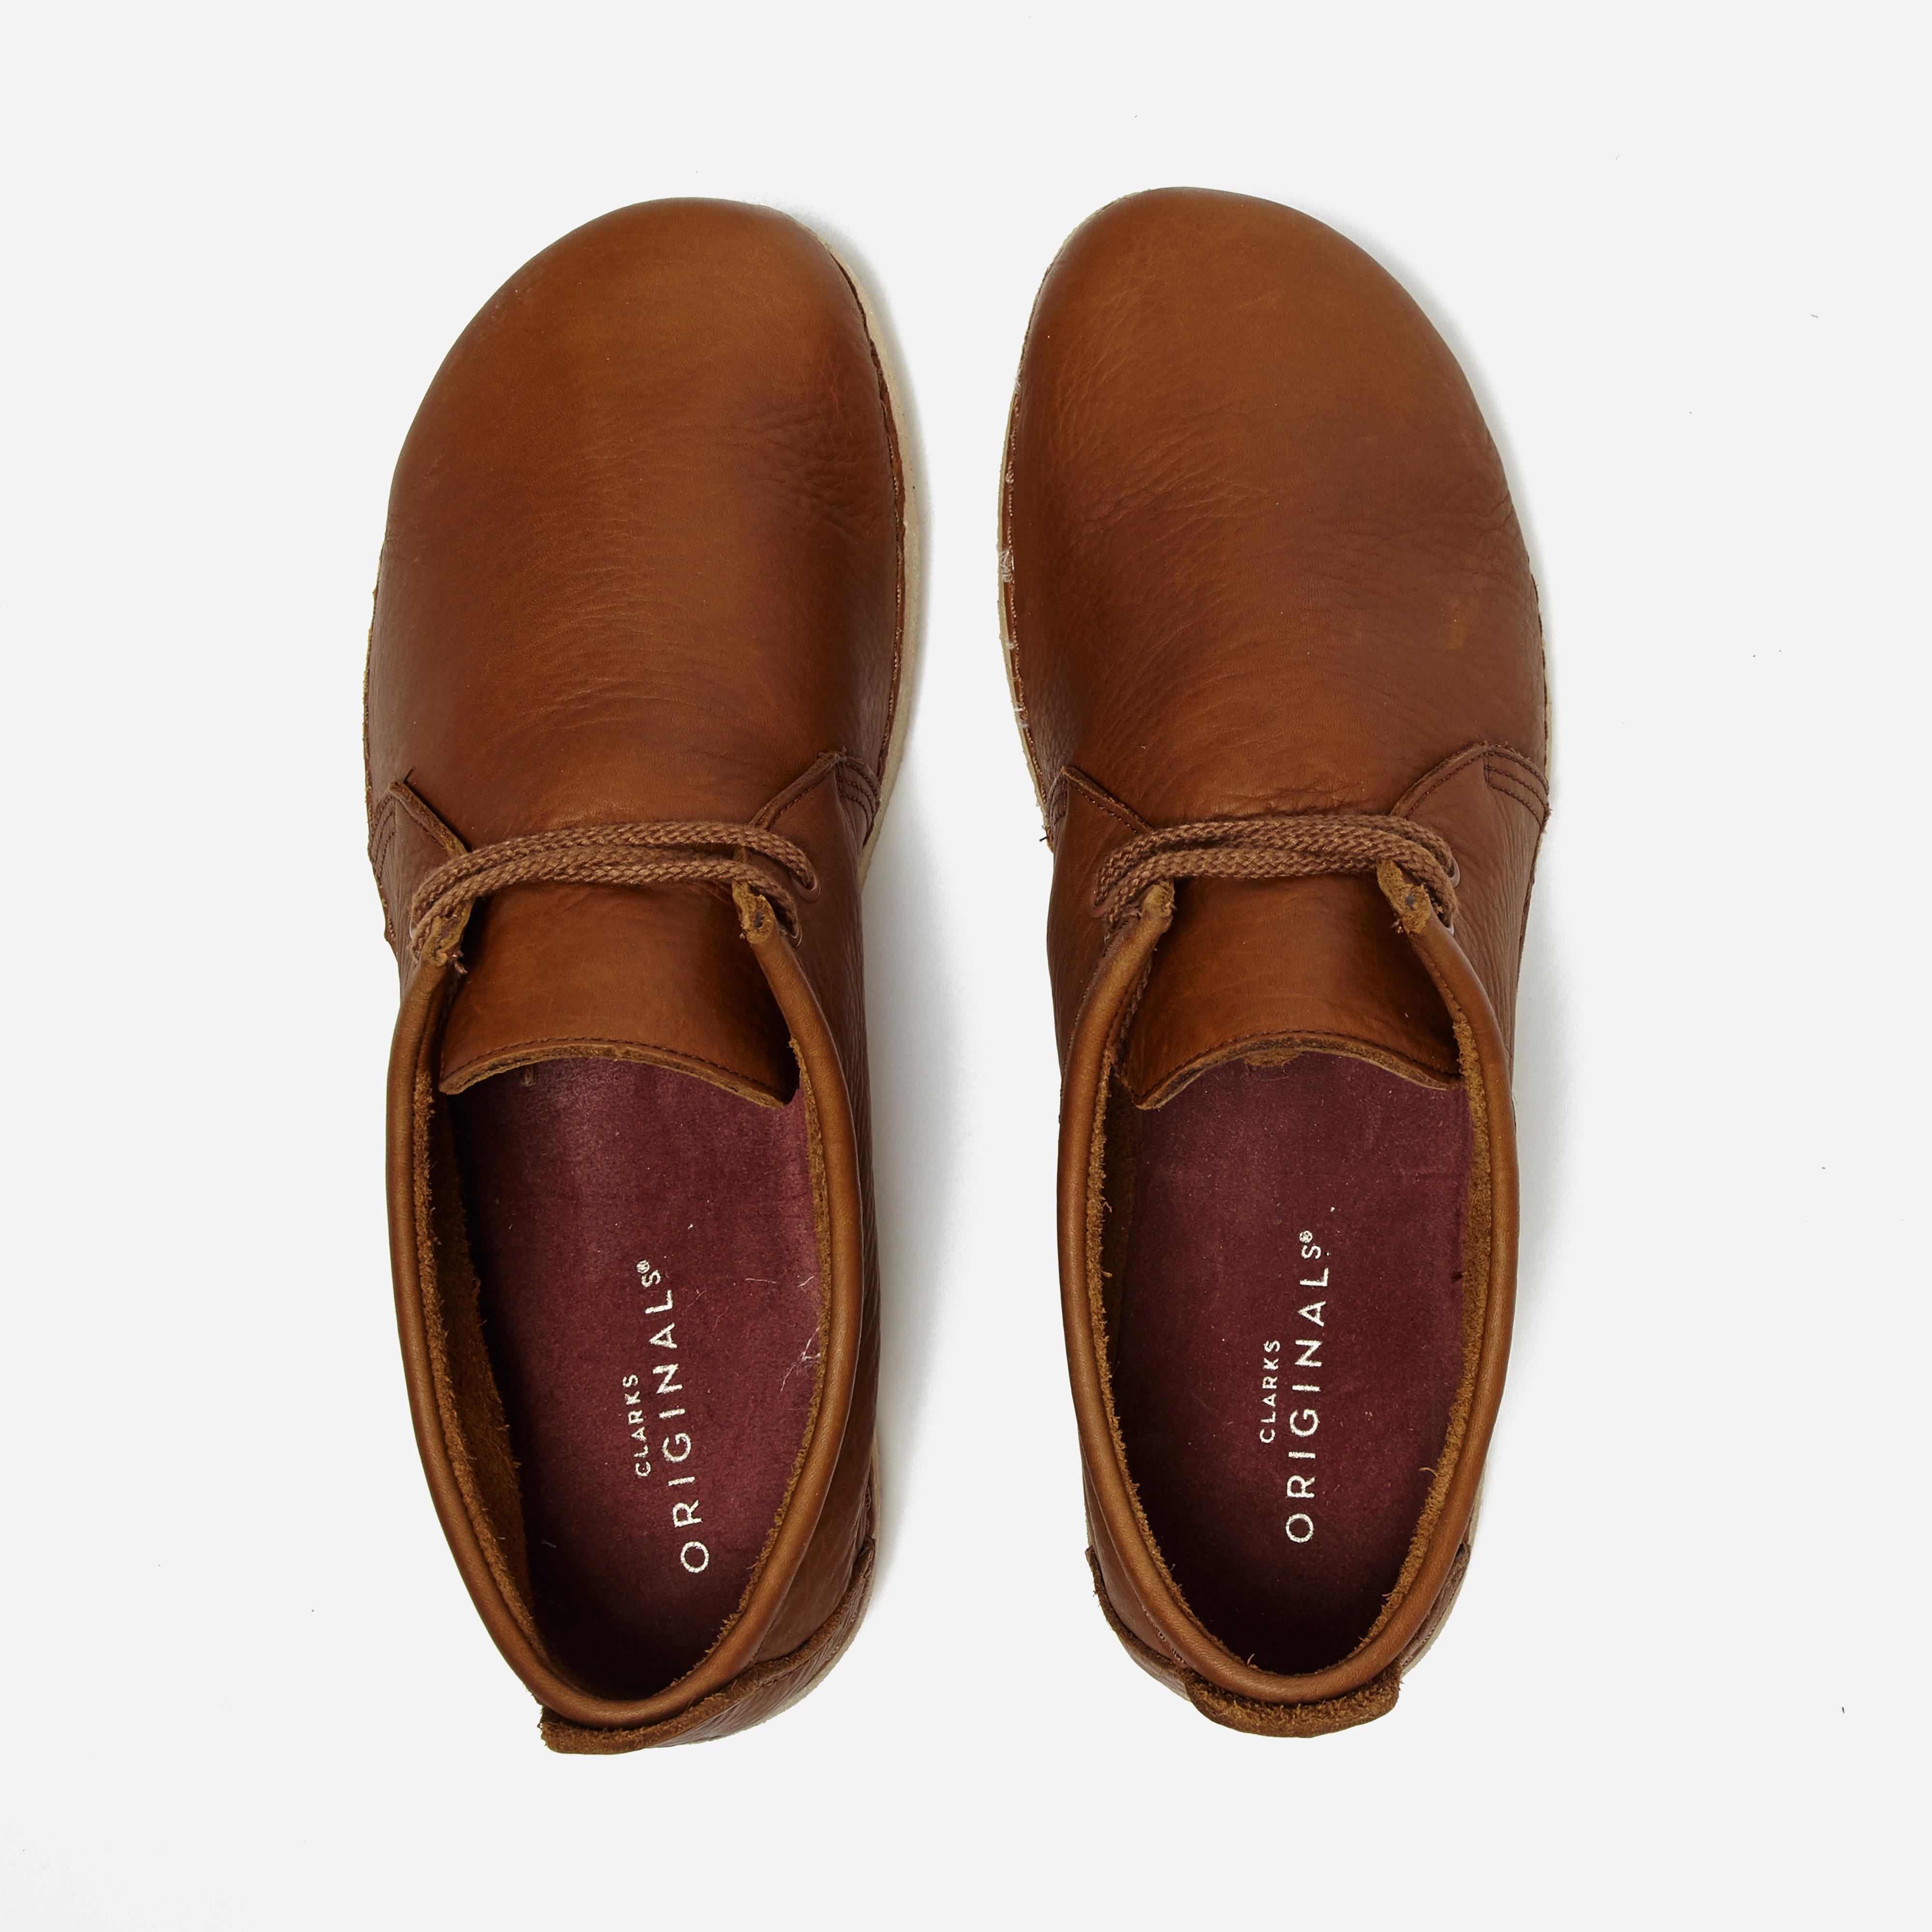 99062c5d7f Clarks Ashton Leather in Brown for Men - Lyst